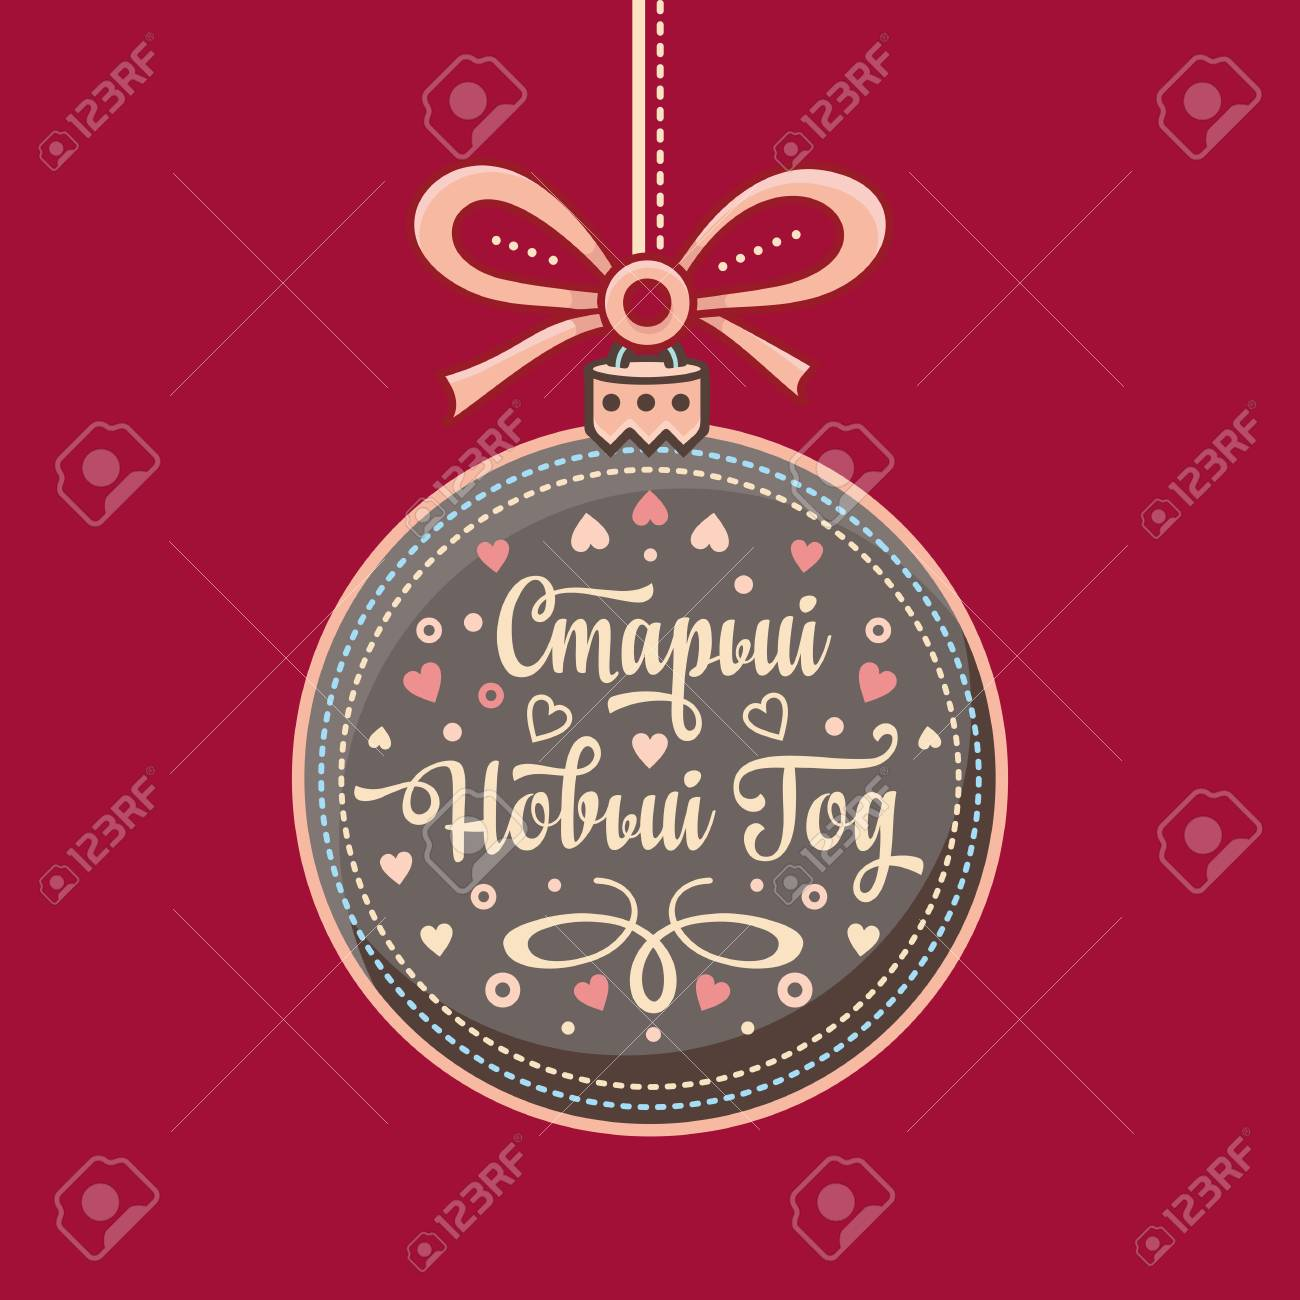 Happy New Year Greeting Card Russian Holiday A Congratulatory